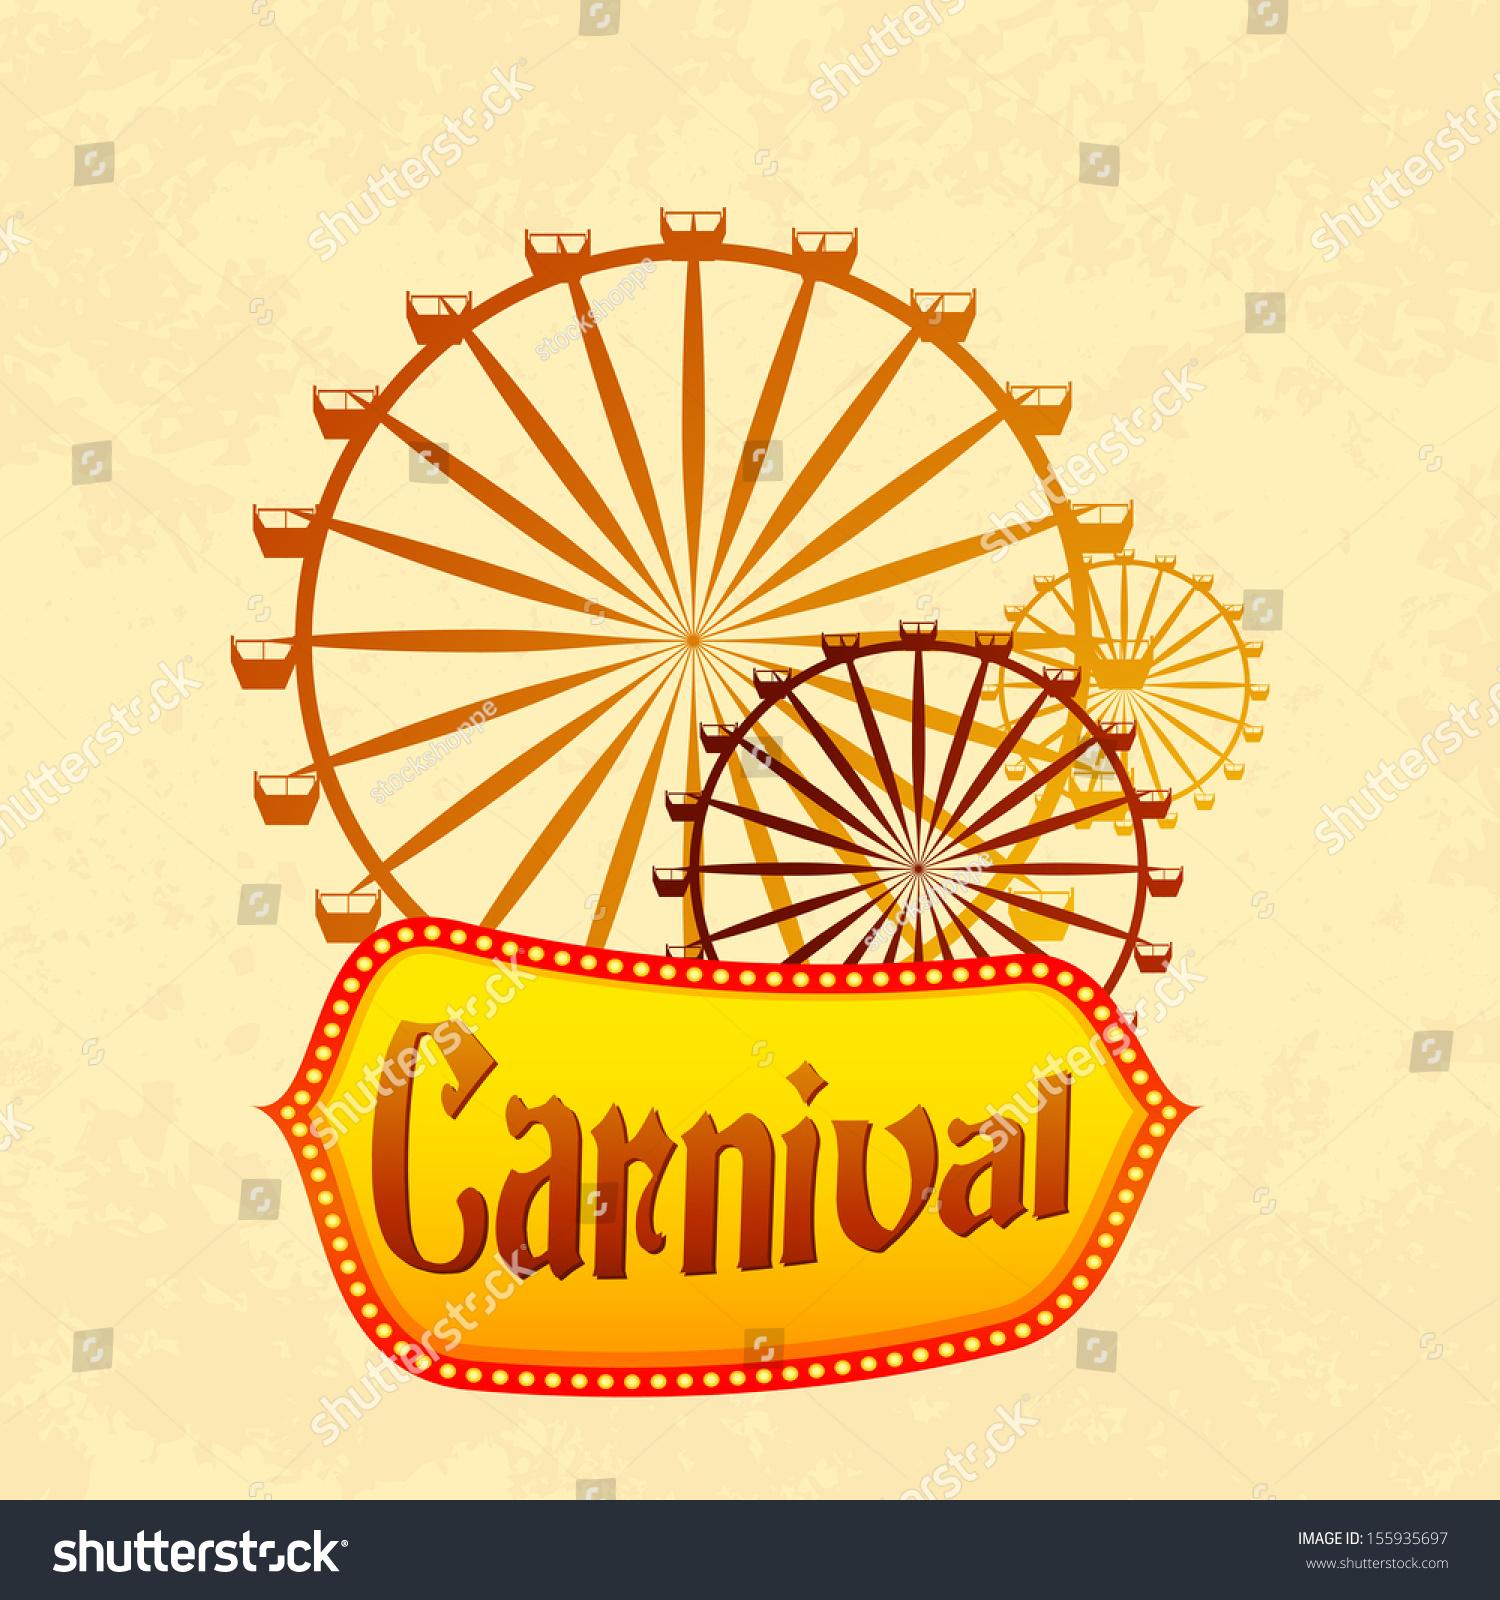 Vector Illustration Giant Wheel Retro Carnival Stock Vector ...